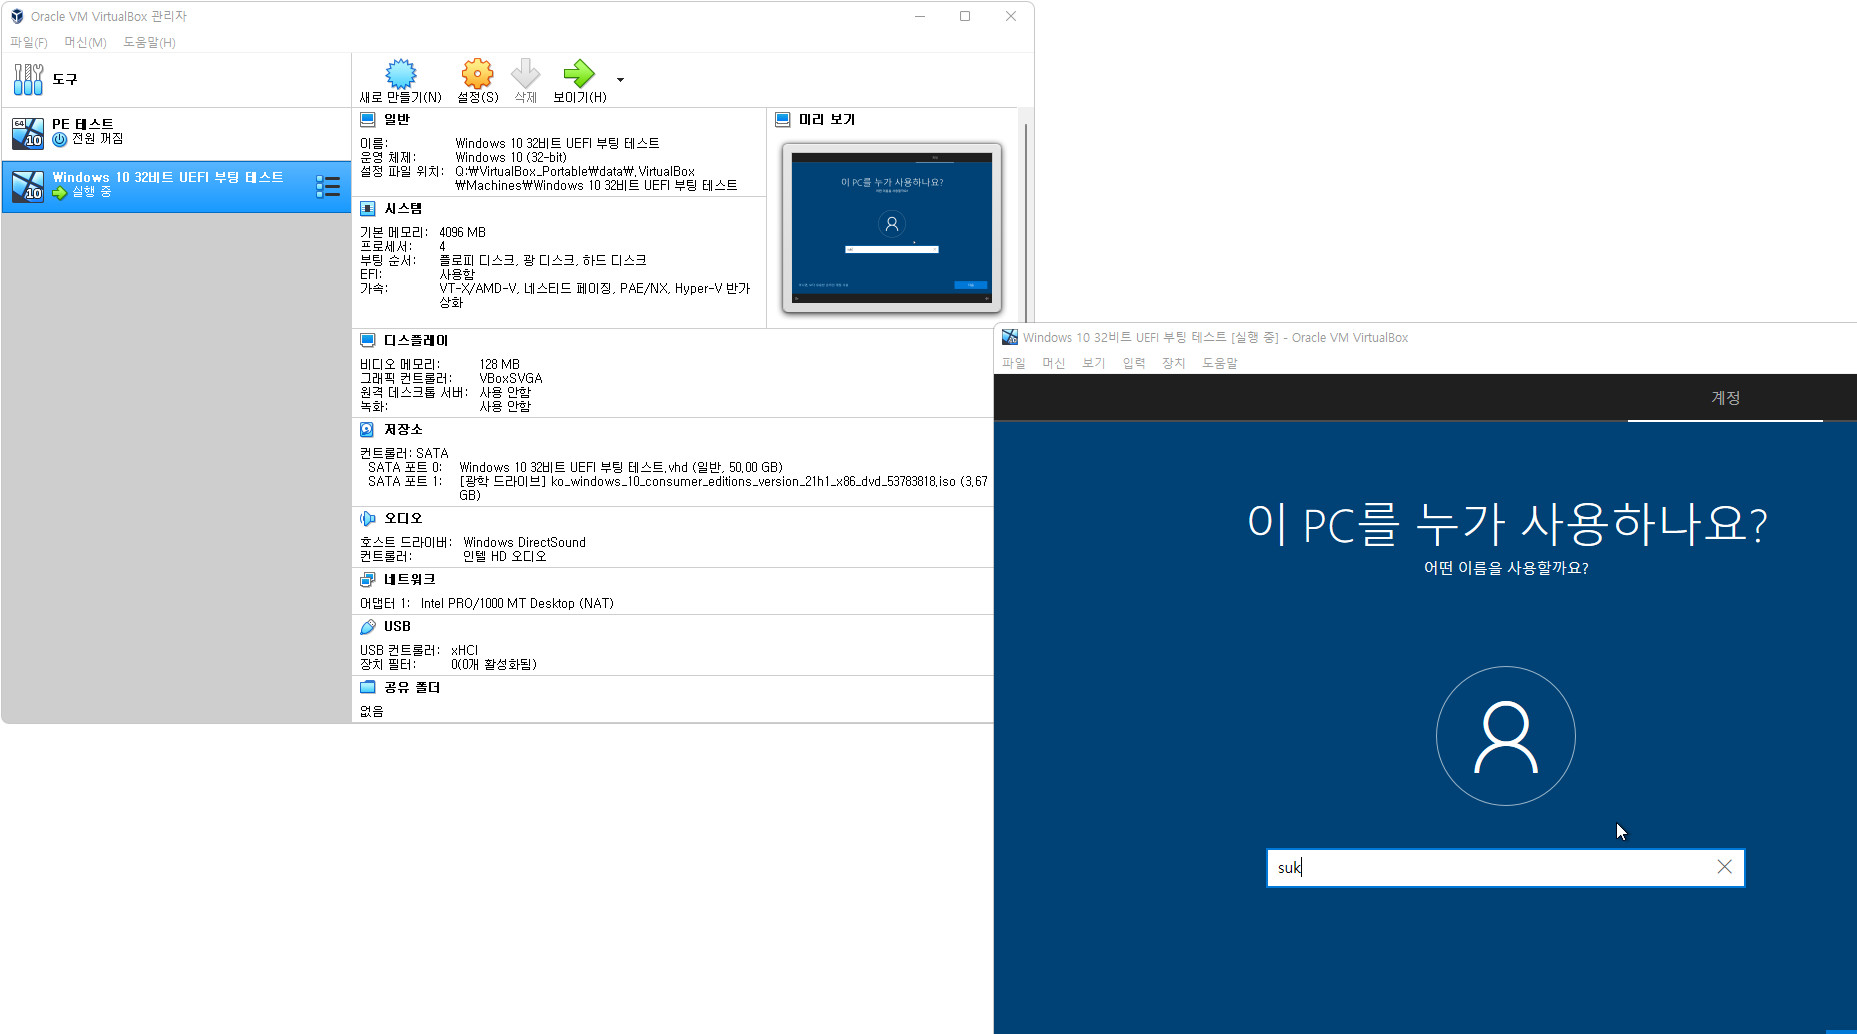 UEFI 부팅은 원래 32비트도 됩니다. 실컴은 메인보드 차원에서 32비트는 제한이 된 것 뿐입니다 - 가상머신에서는 32비트도 UEFI 됩니다 2021-09-08_144150.jpg